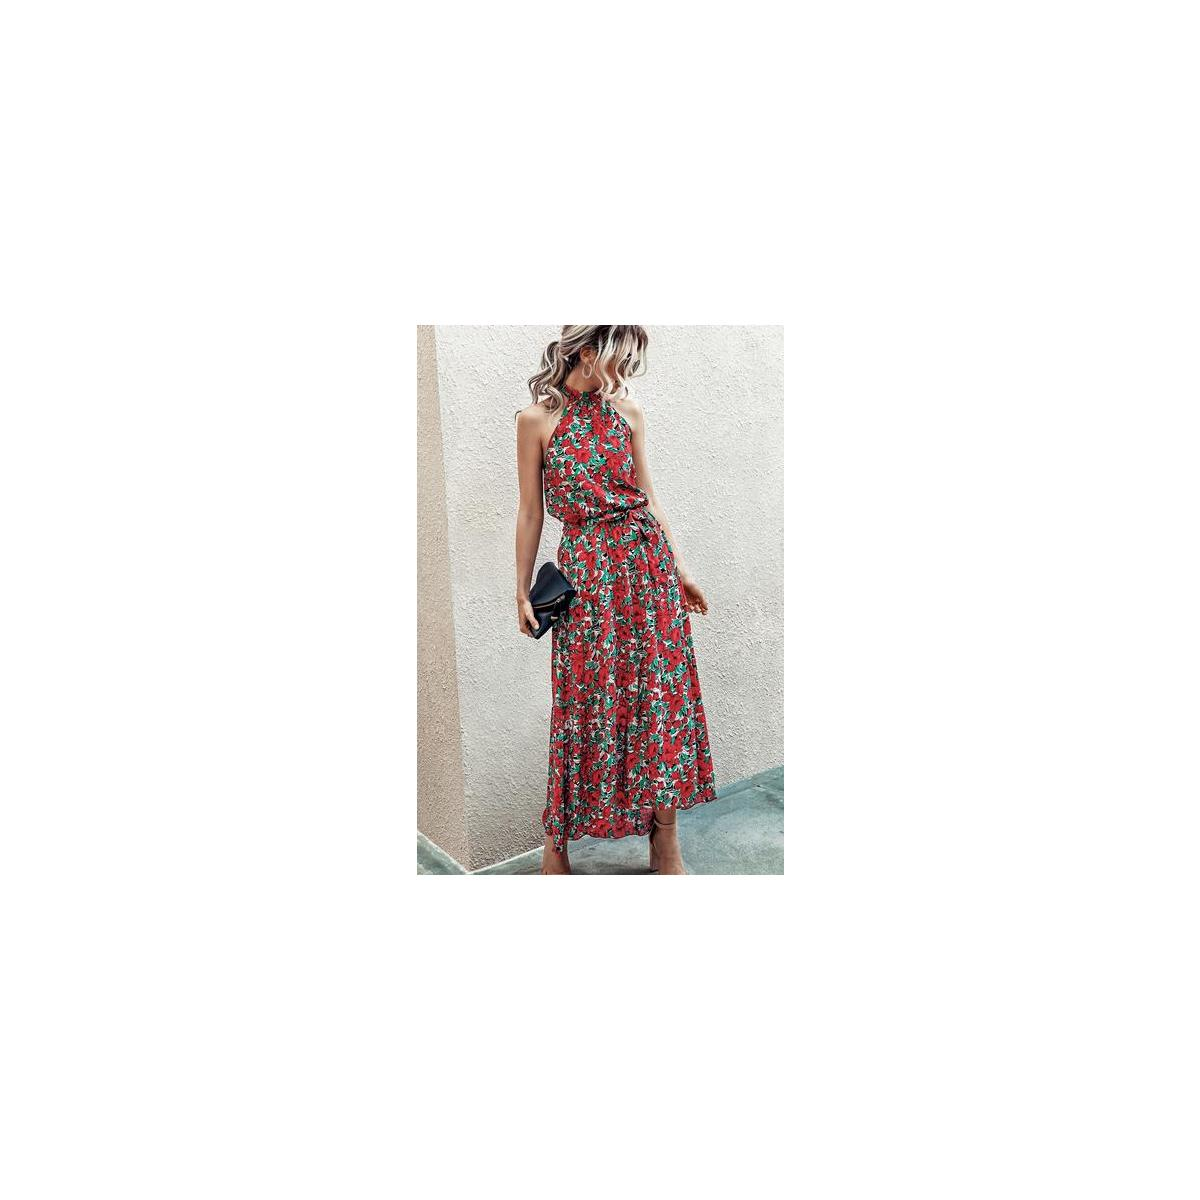 Women's Halter Neck Floral Print Polka Dot Solid Color Long Beach Maxi Dress Sundress with Belt Color: Red